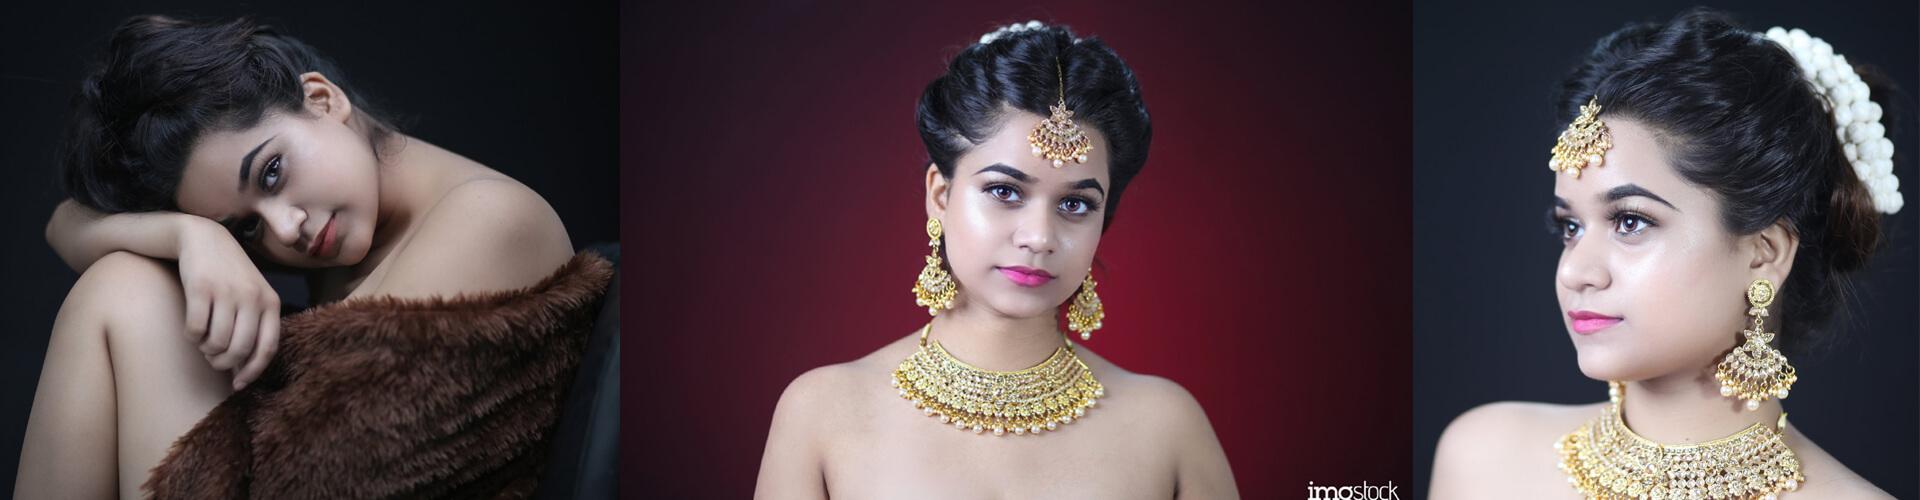 Sweta - Modeling Photography, ImgStock